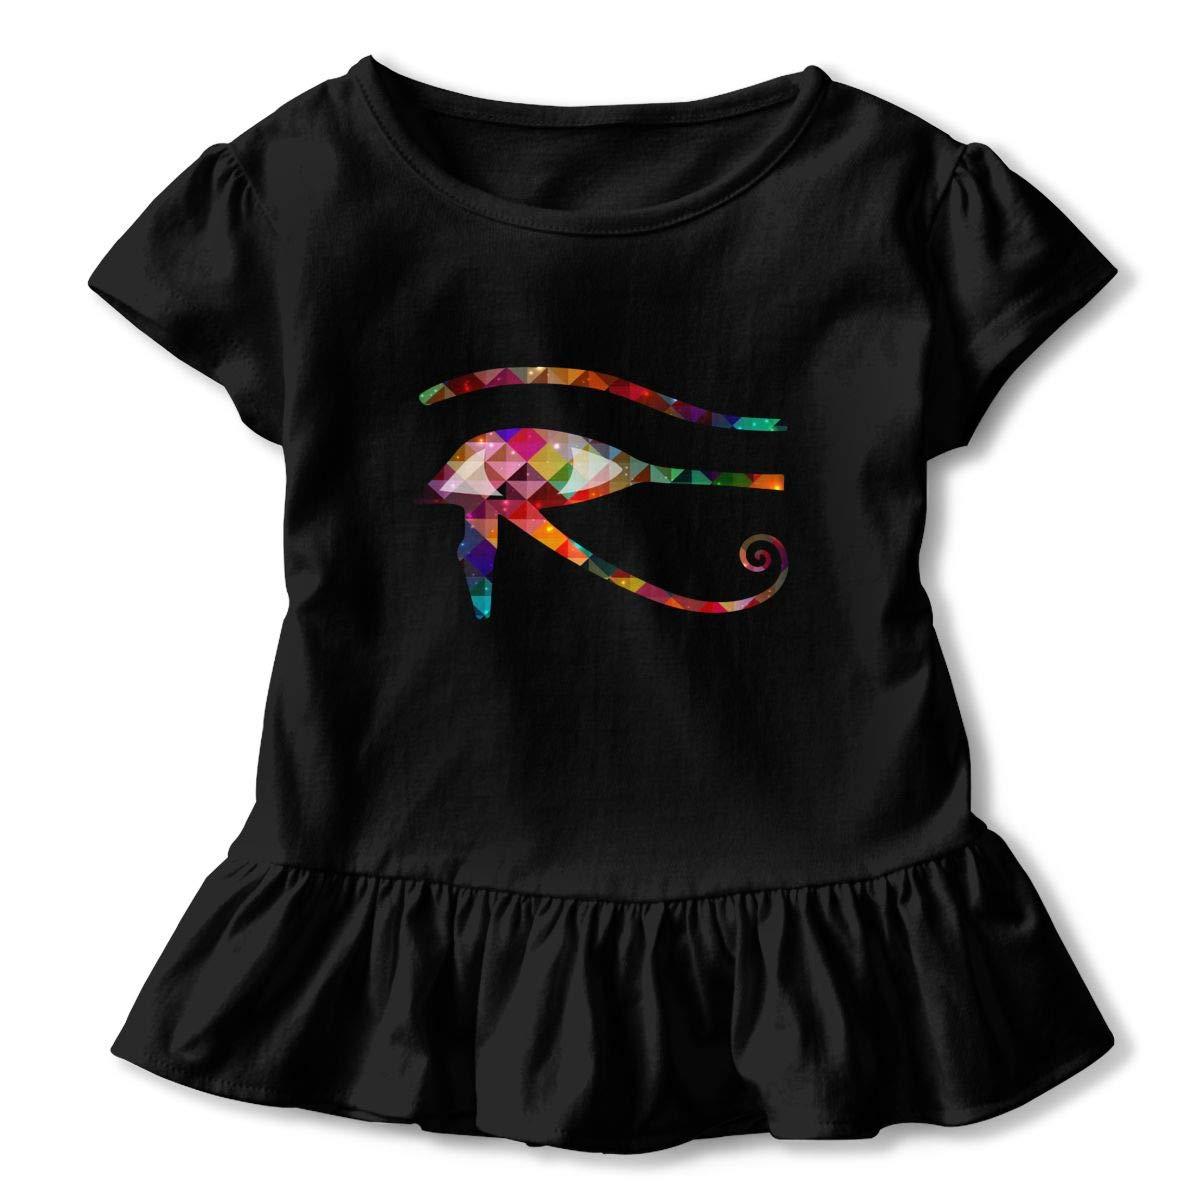 CZnuen Eye of Horus Prismatic 2-6T Baby Girls Cotton Jersey Short Sleeve Ruffle Tee